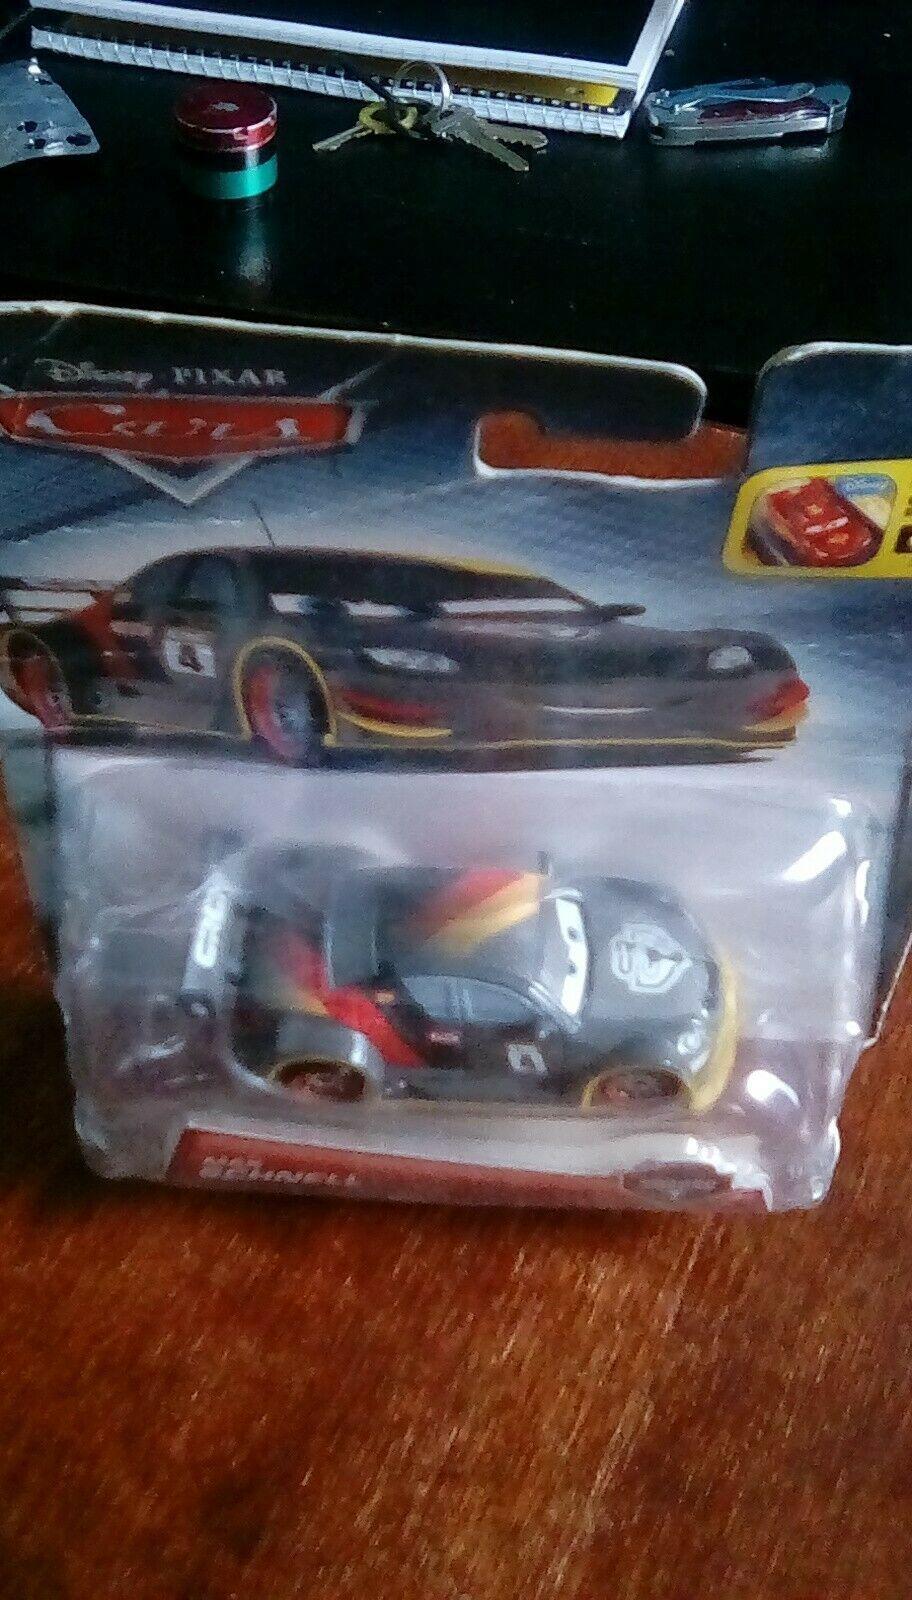 2015 disney/pixar MAC SCHNELL CAR cars mint condition image 4